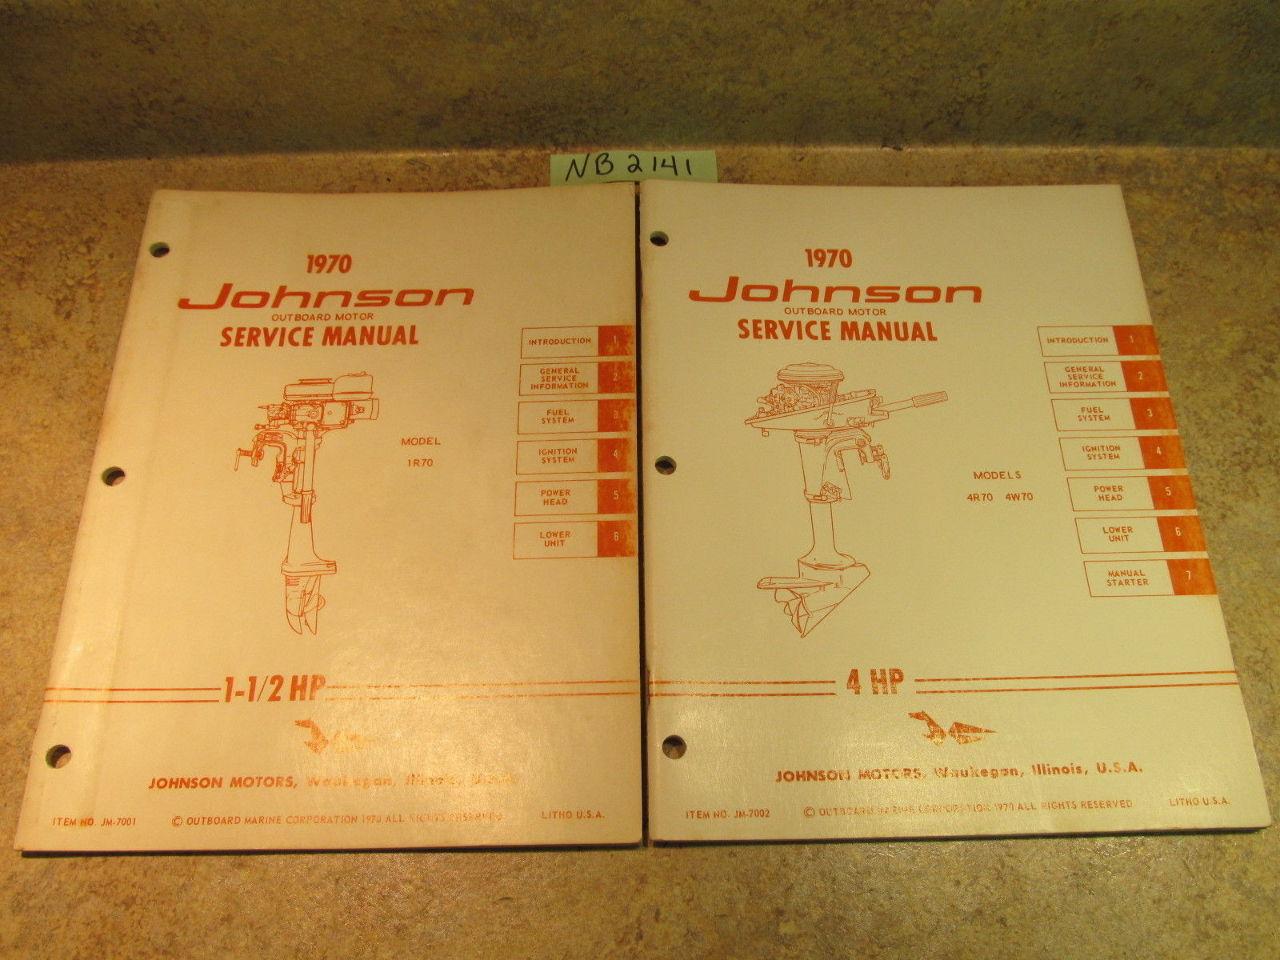 115 Hp Johnson outboard manual